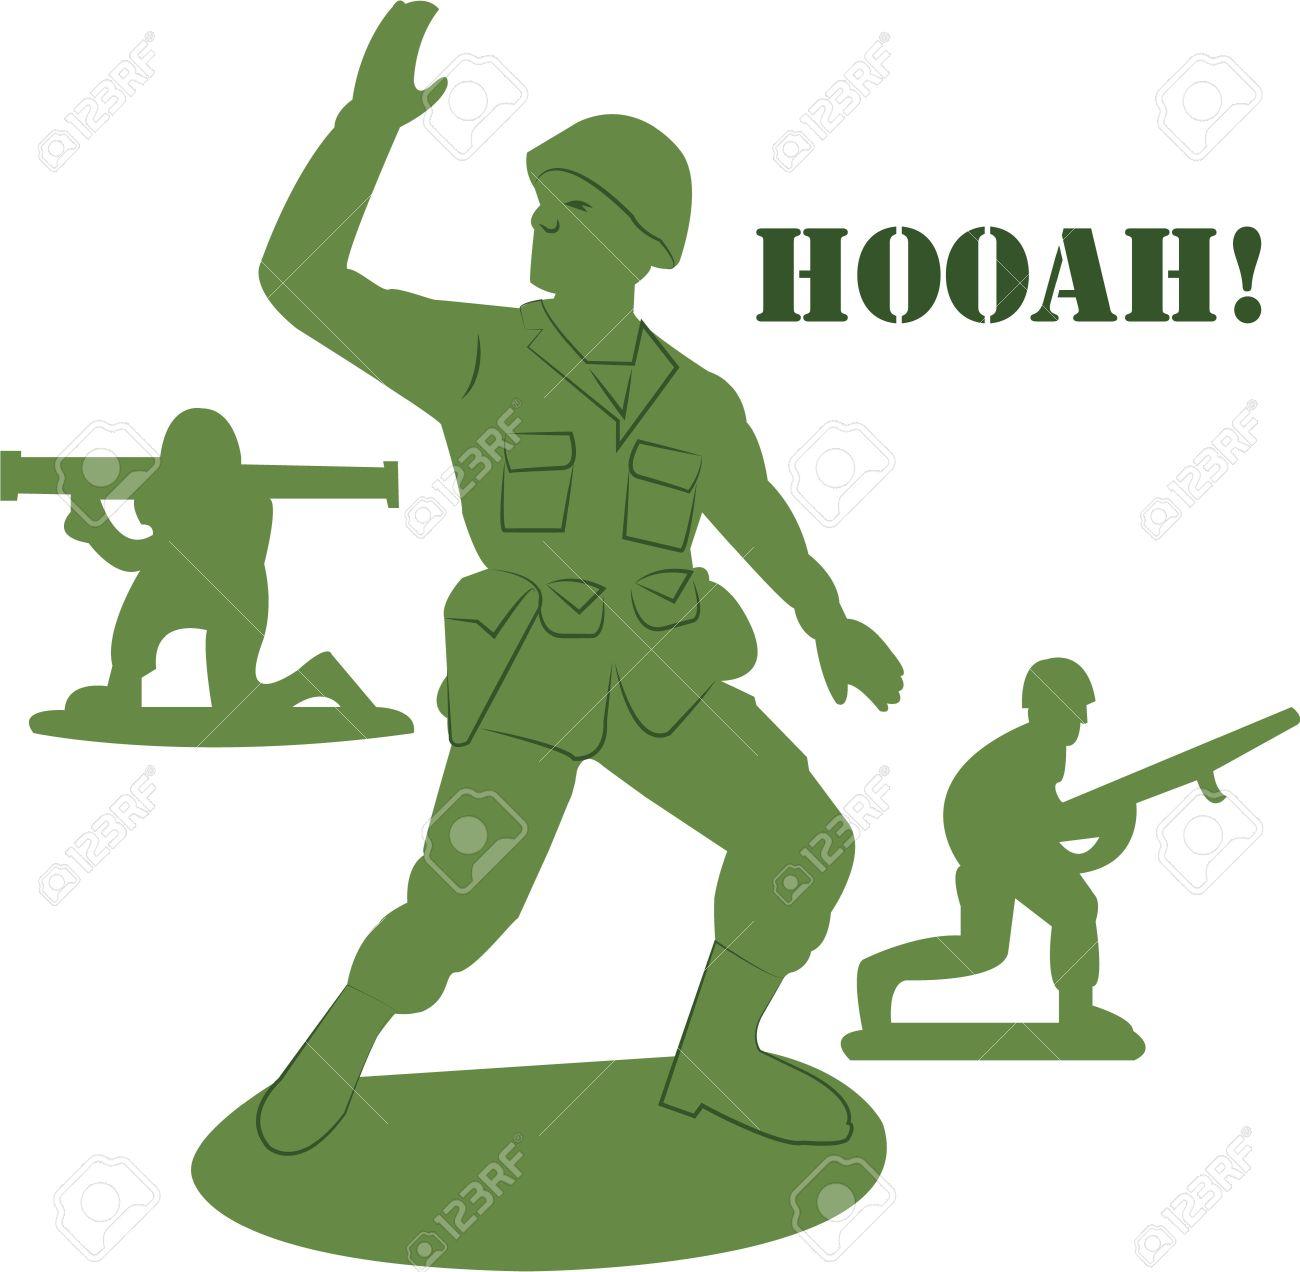 Little green army man clipart.